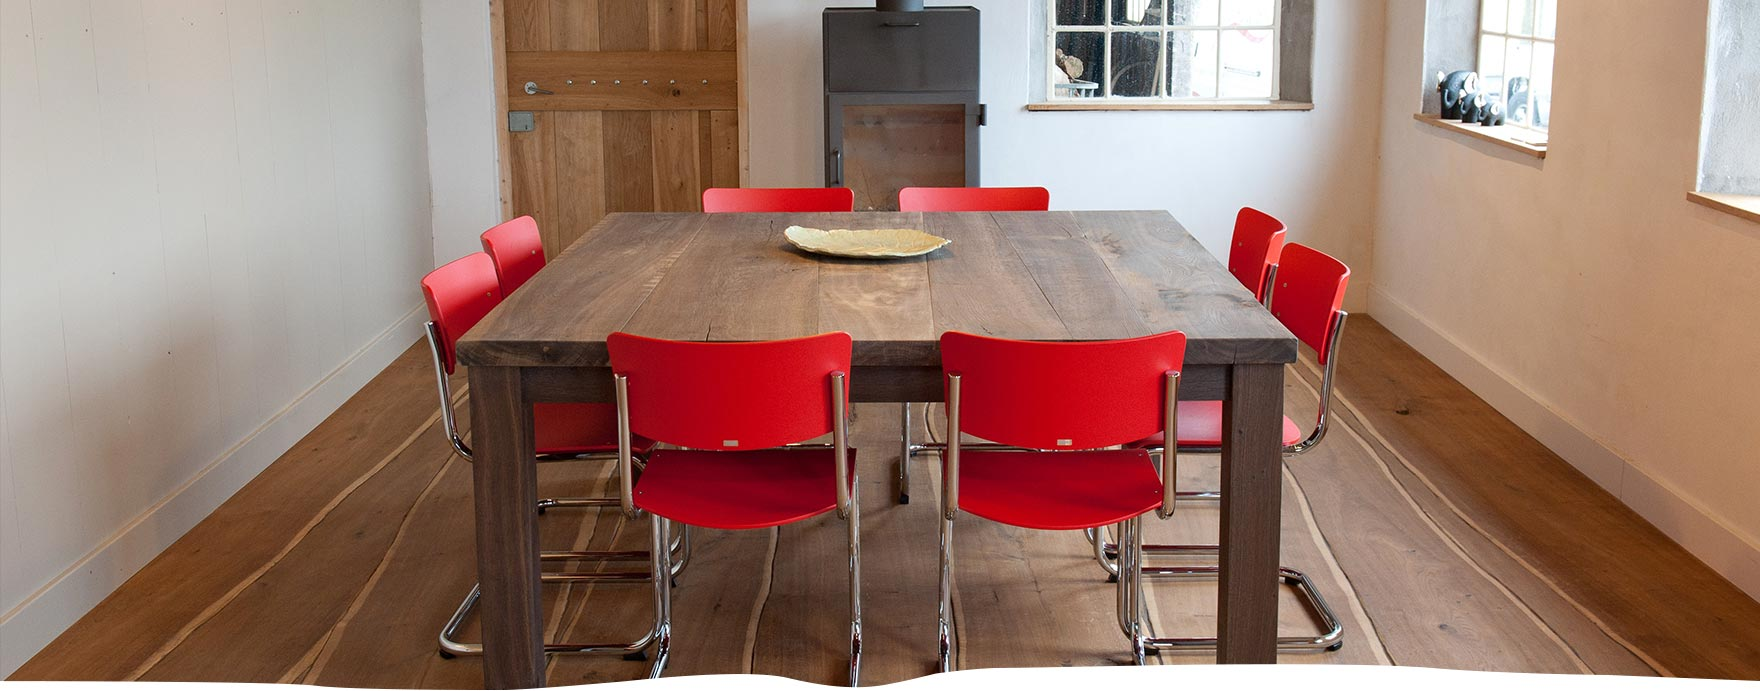 Vierkante massief Eiken tafel, gemaakt van Europees eiken - De Hout Snip